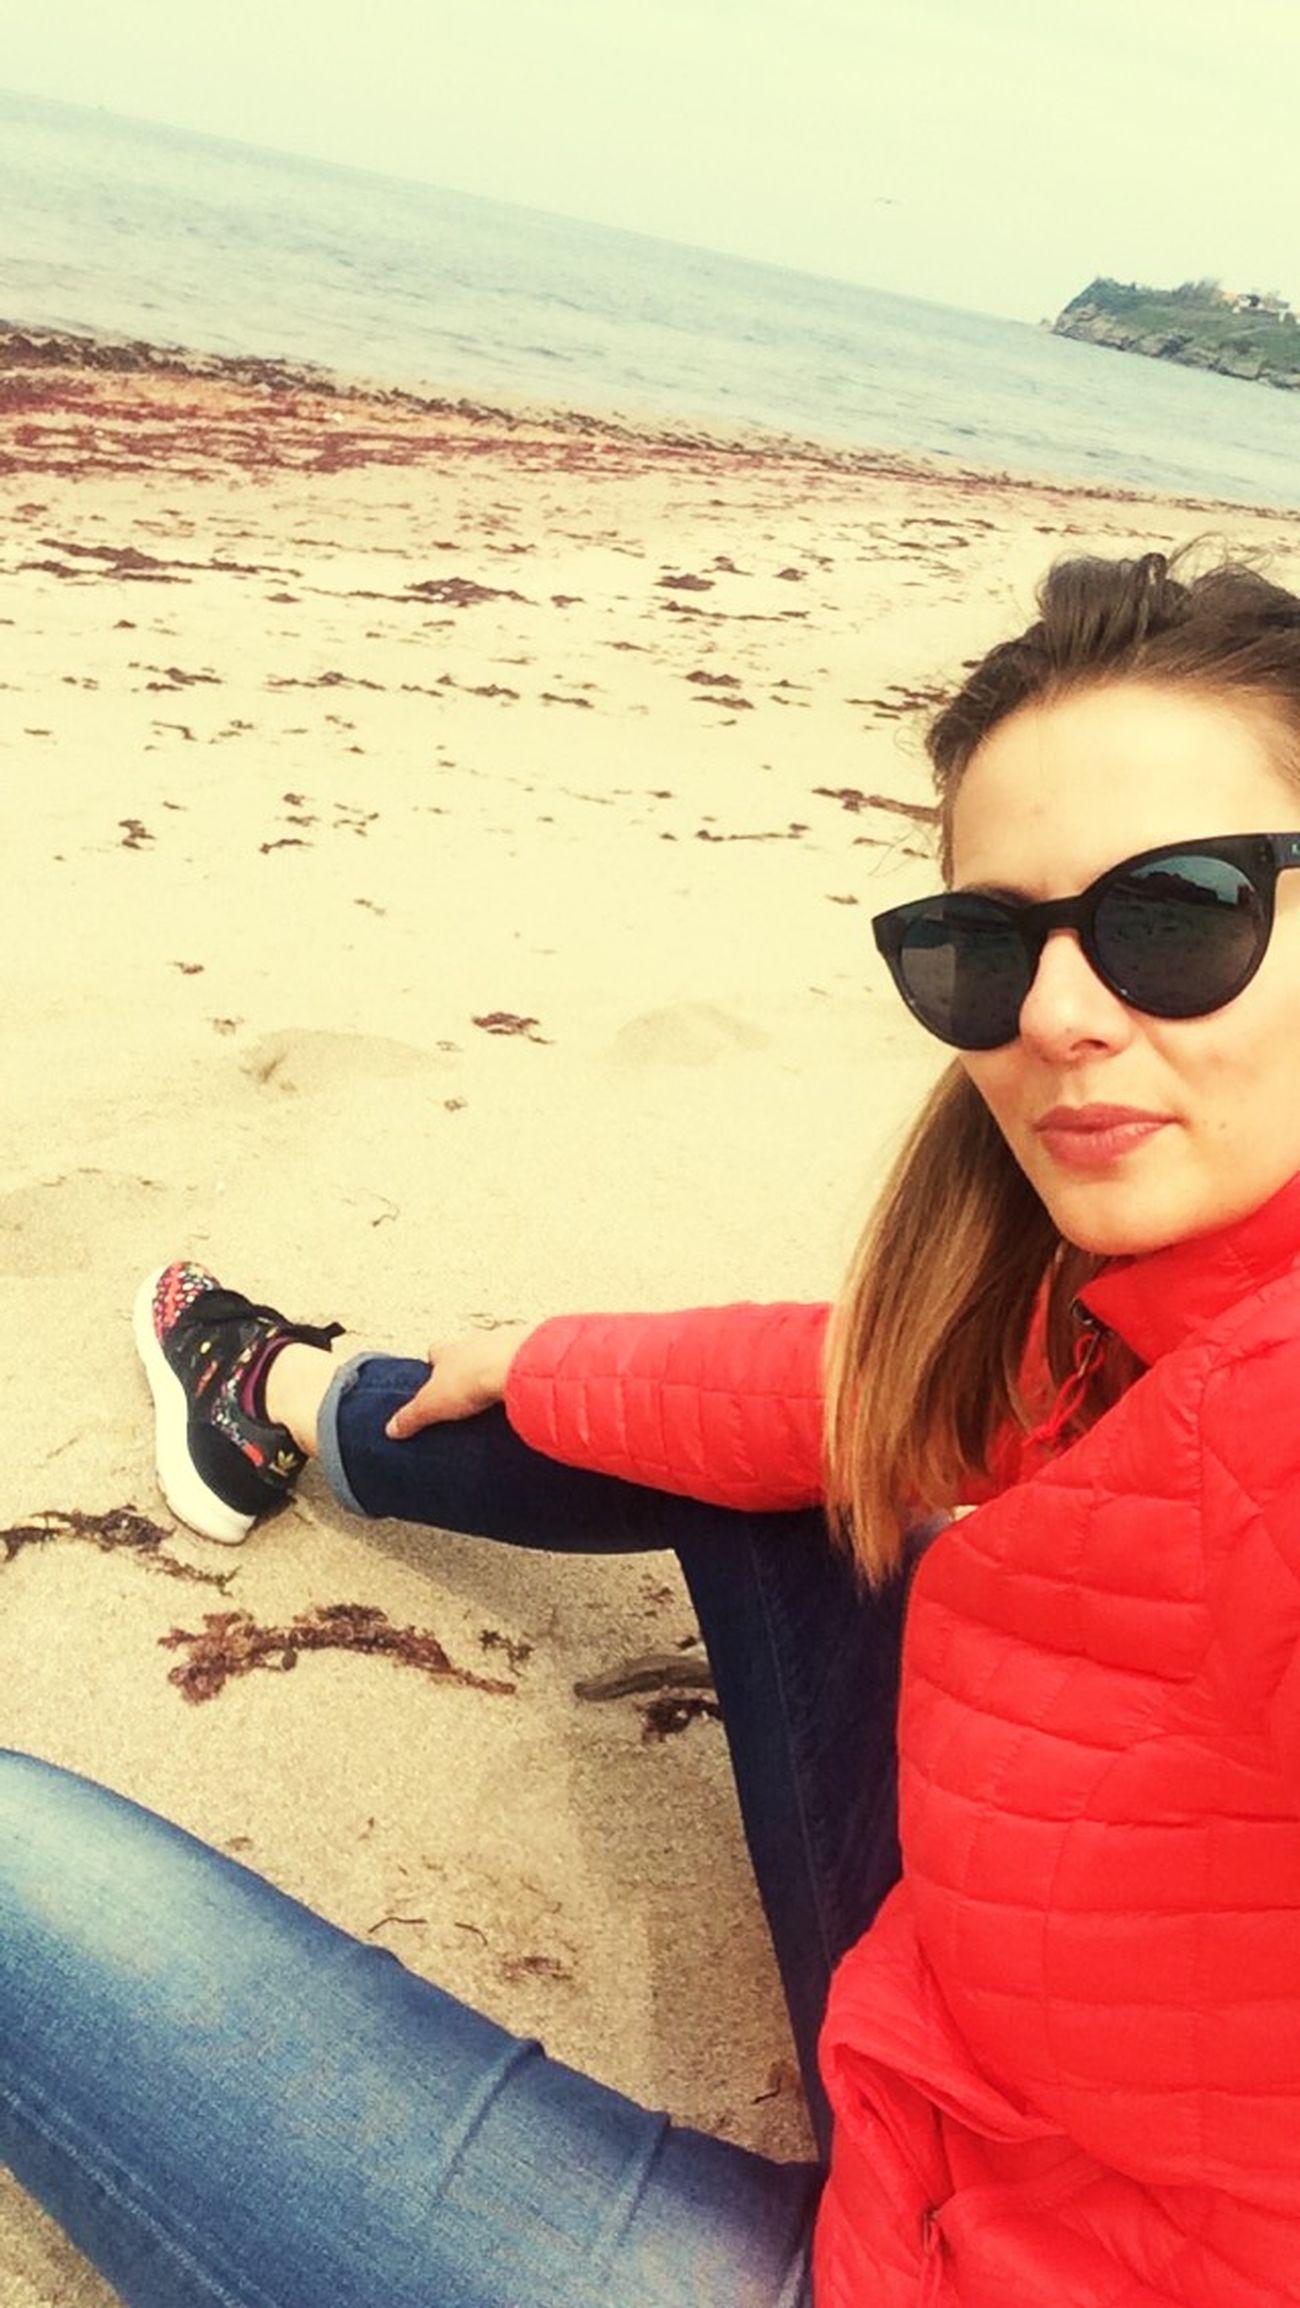 Sunny☀ Season215 Seaside Living Seaside Exploring Bulgaria <3